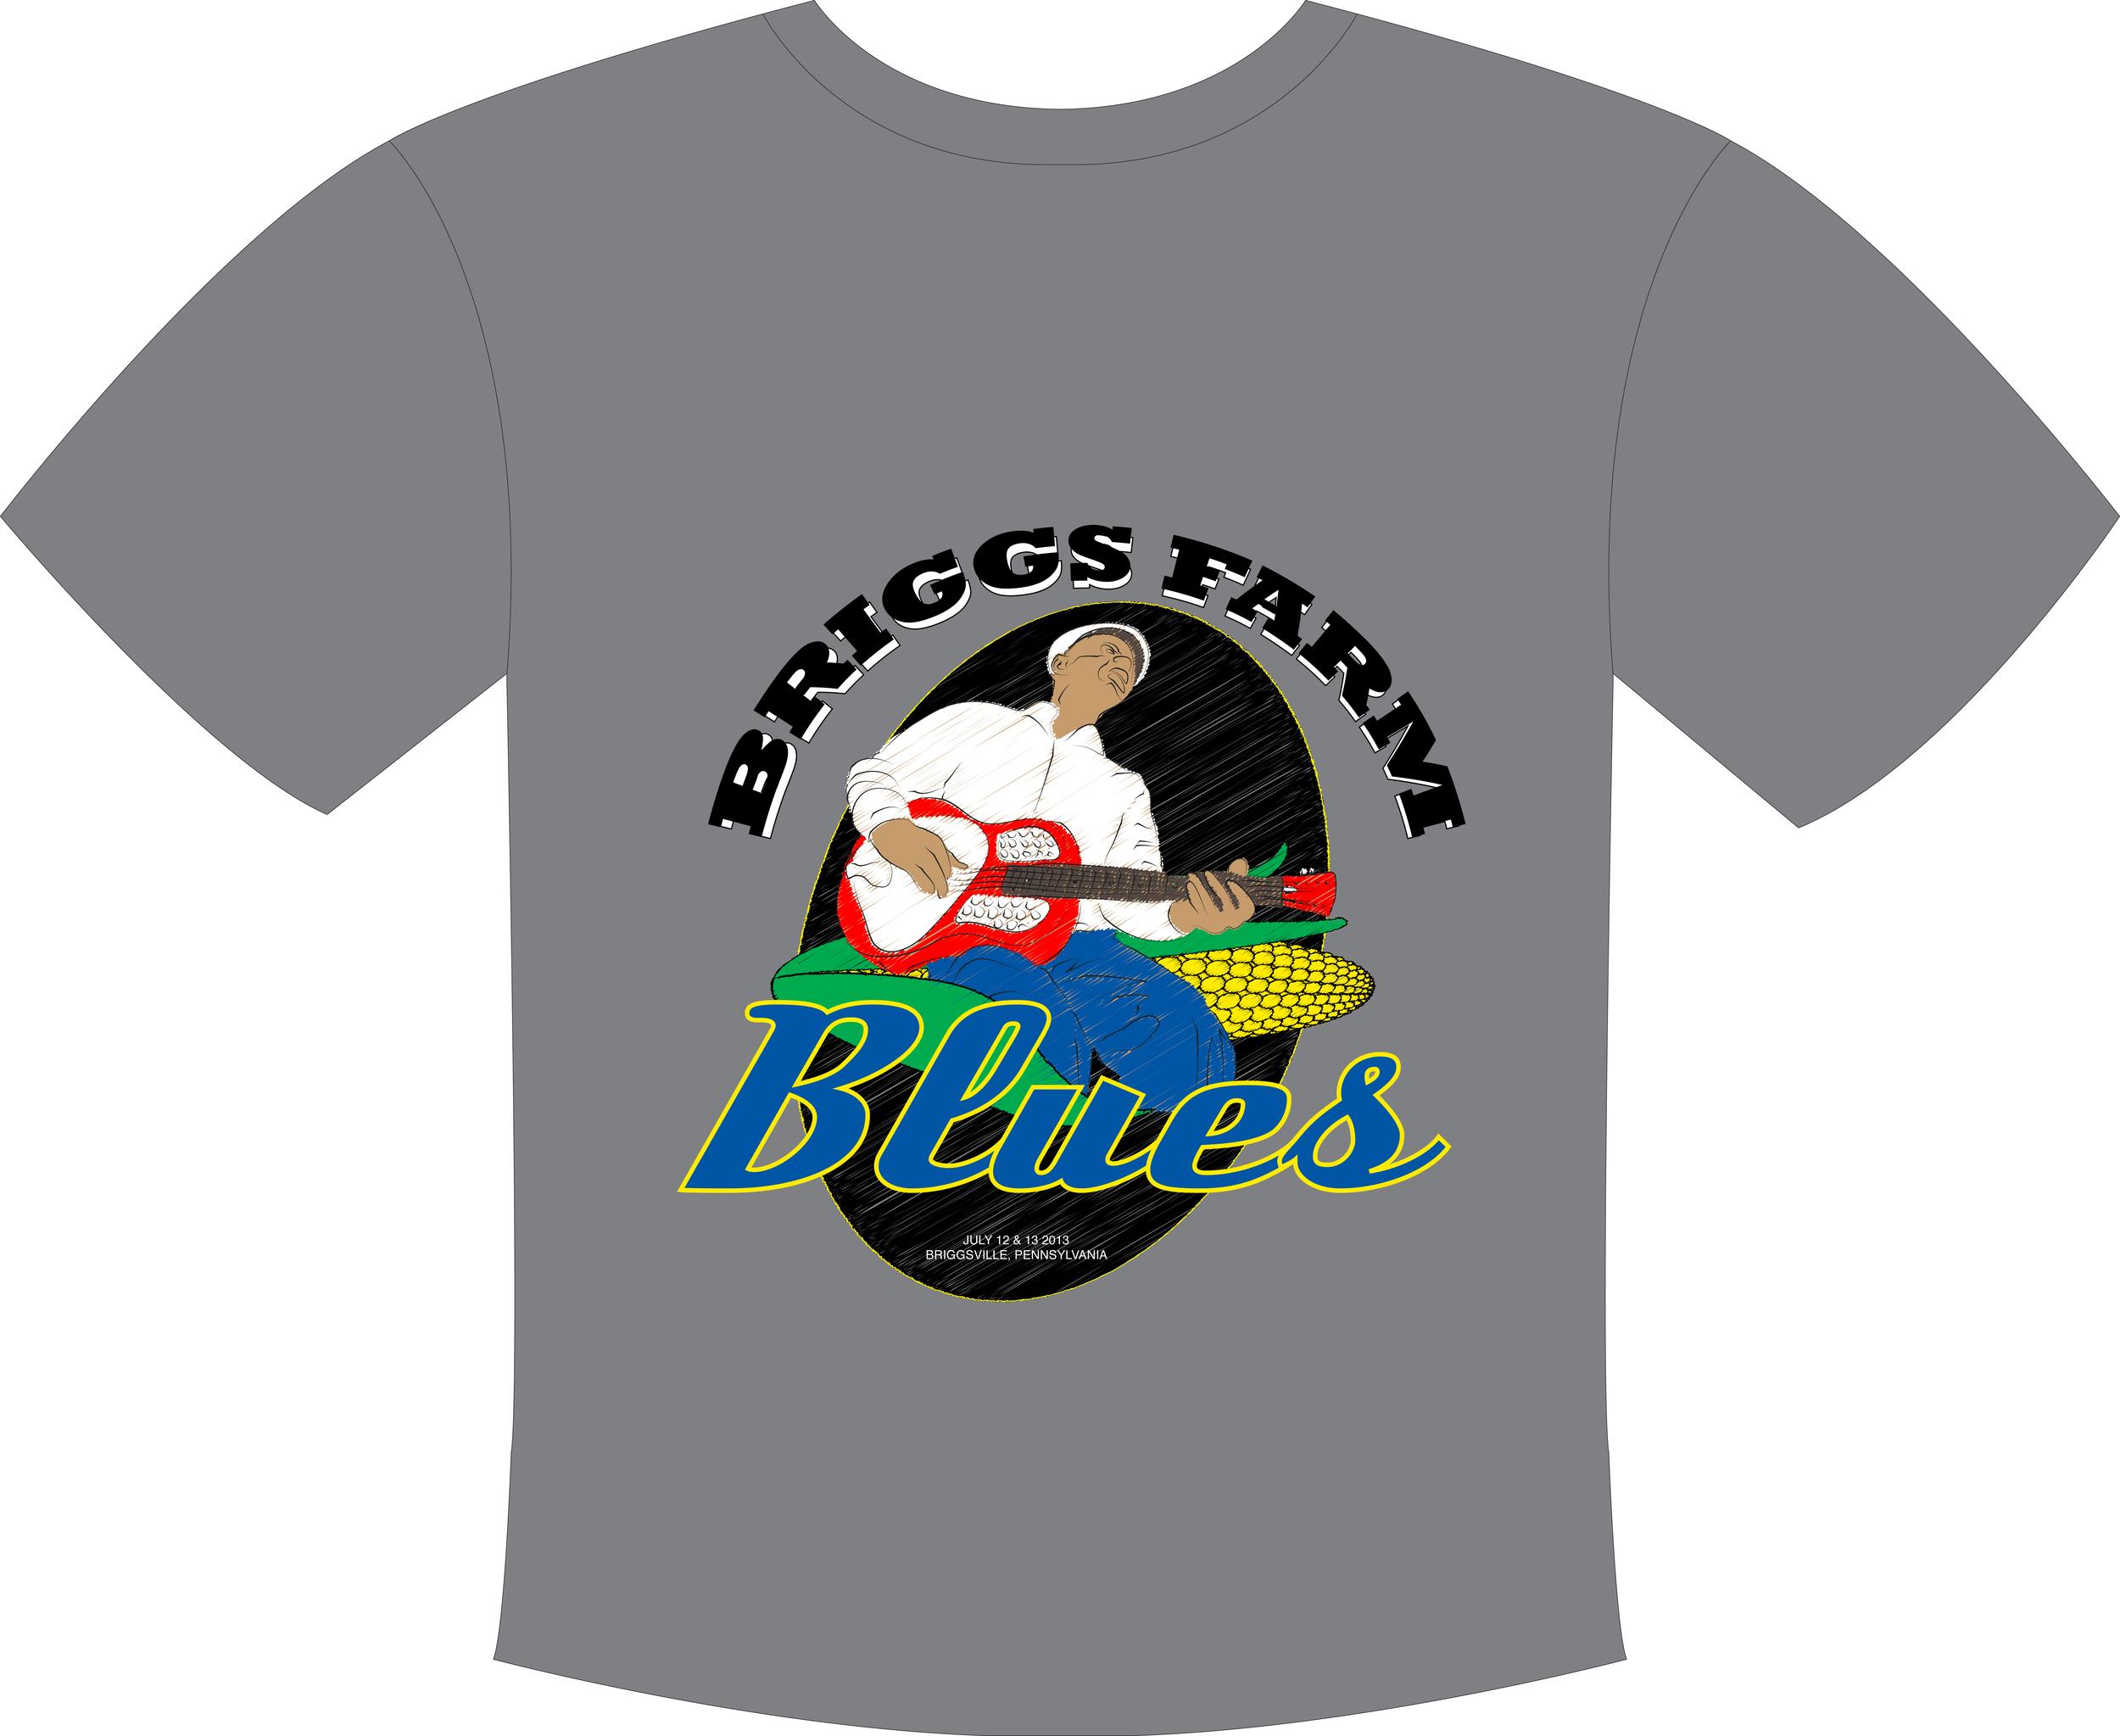 briggs bluesman.1 2013.jpg